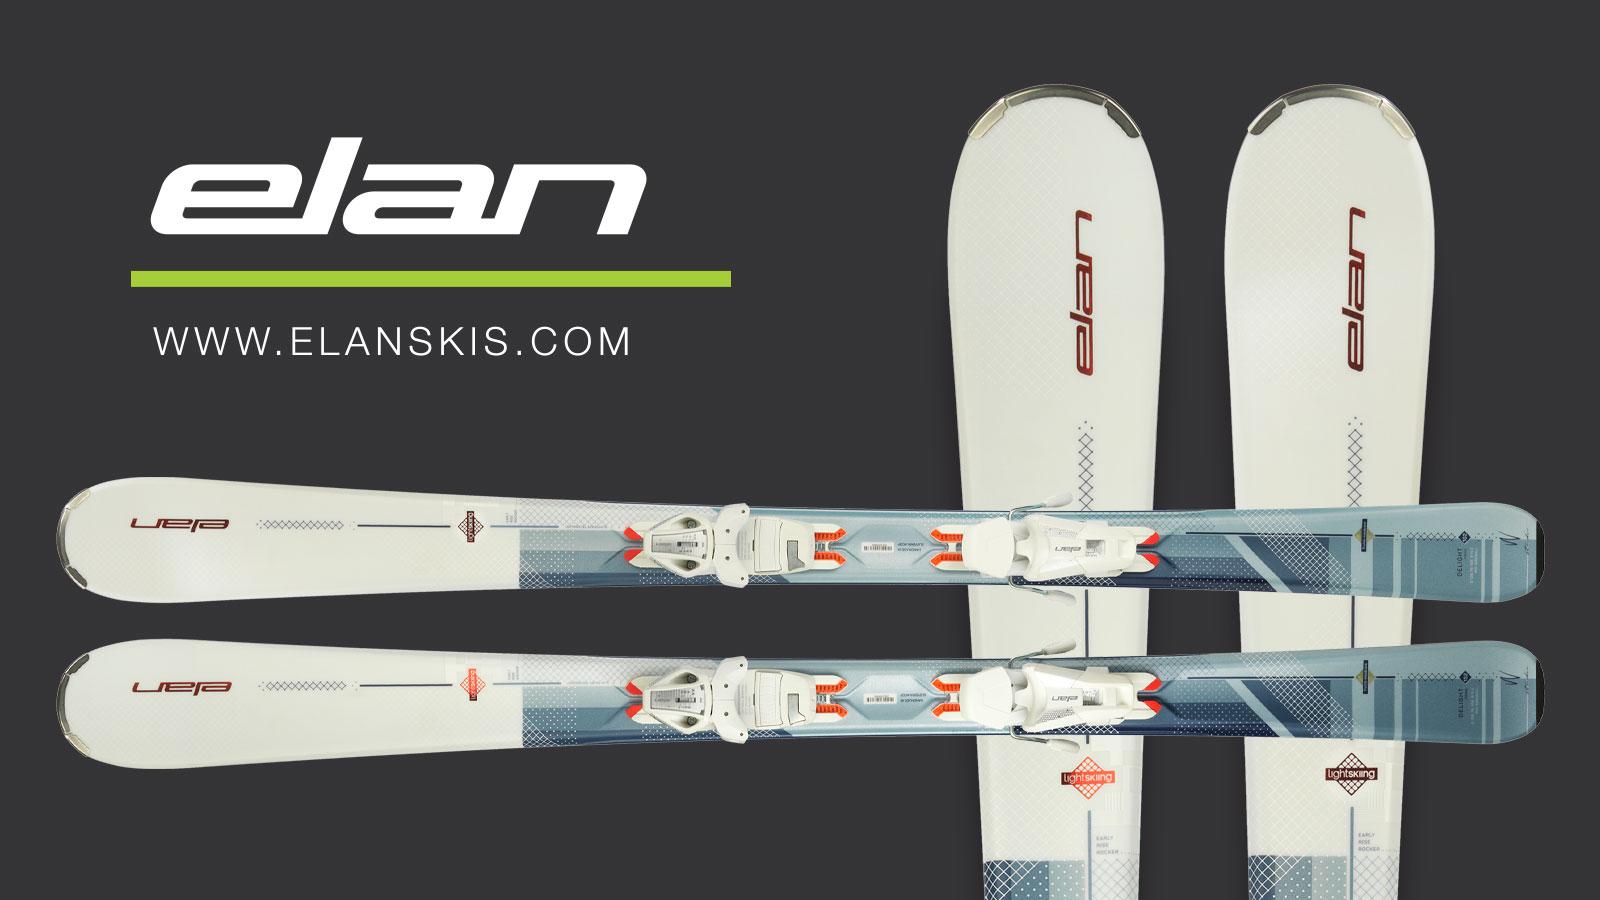 win a pair of elan delight prime women's skis with mountain life and elan skis